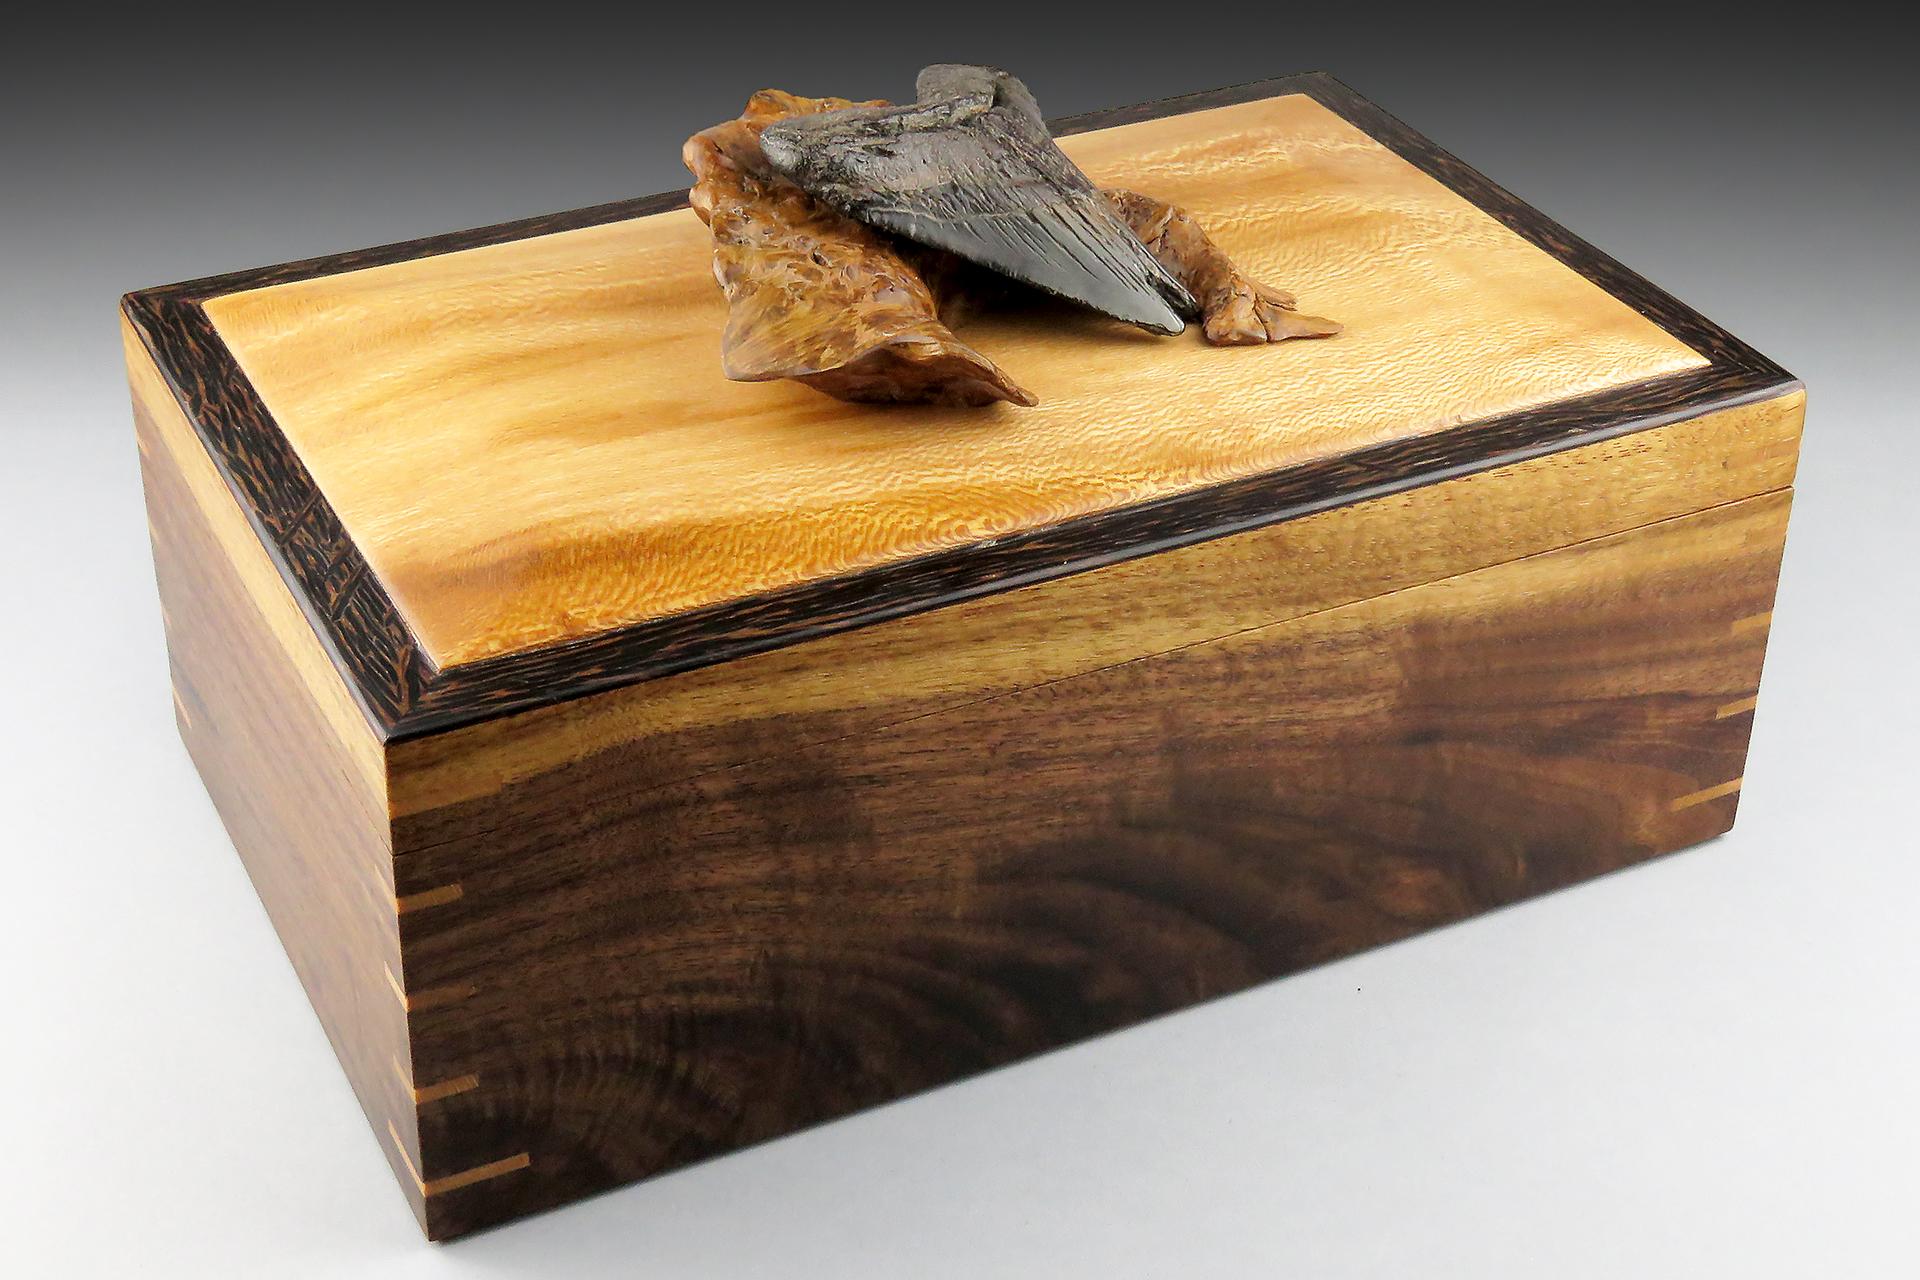 Megalodon Jewelry Box: $495